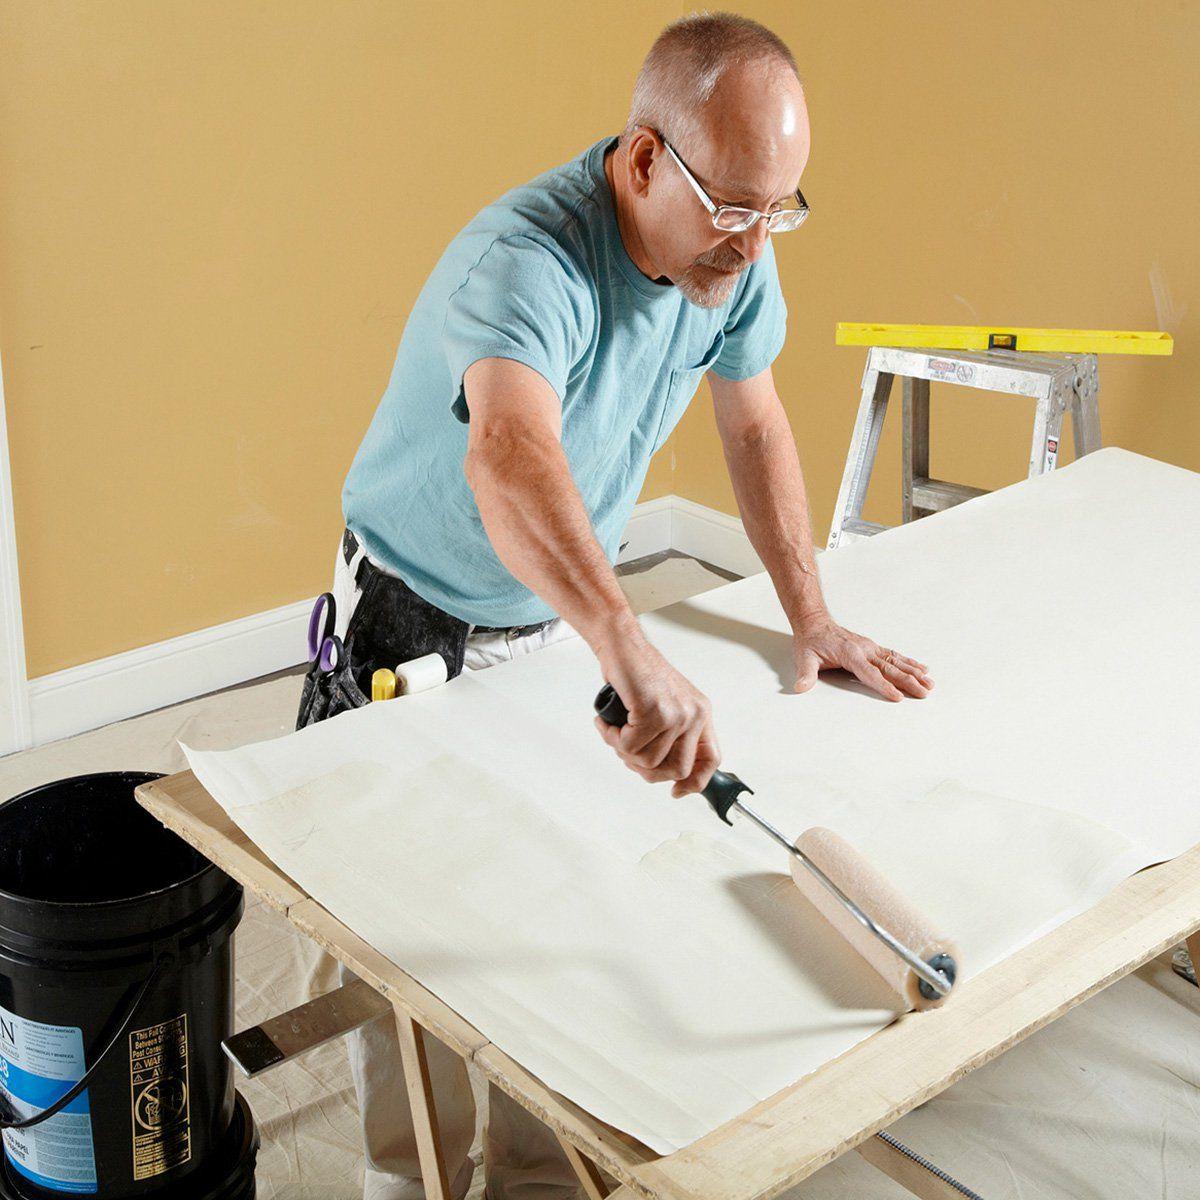 How To Hang Wallpaper How to hang wallpaper, Wallpaper, Tips